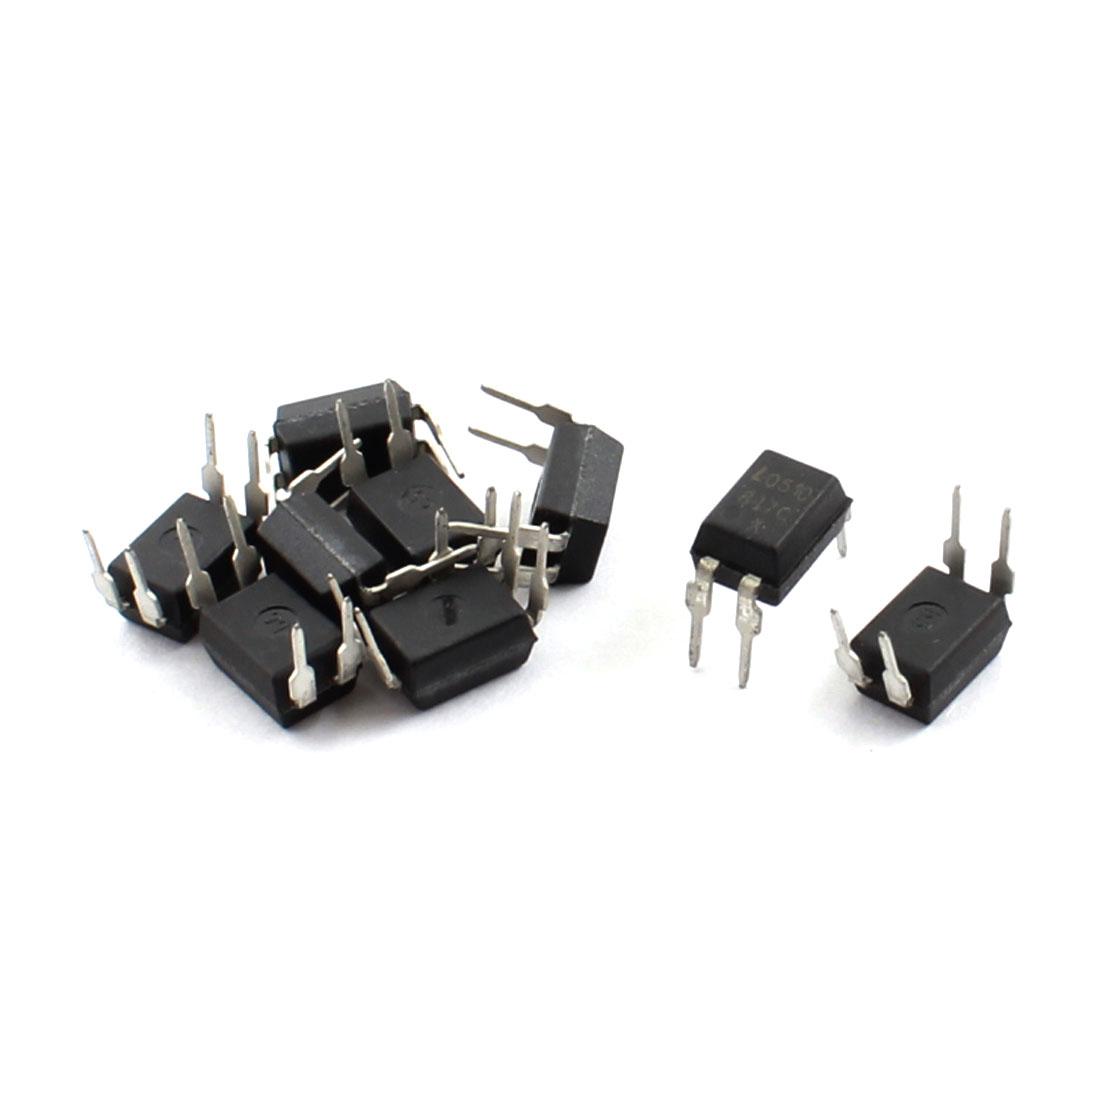 10Pcs PCB Board Through Hole PC817C PC817 EL817 817C Optocoupler DIP-4